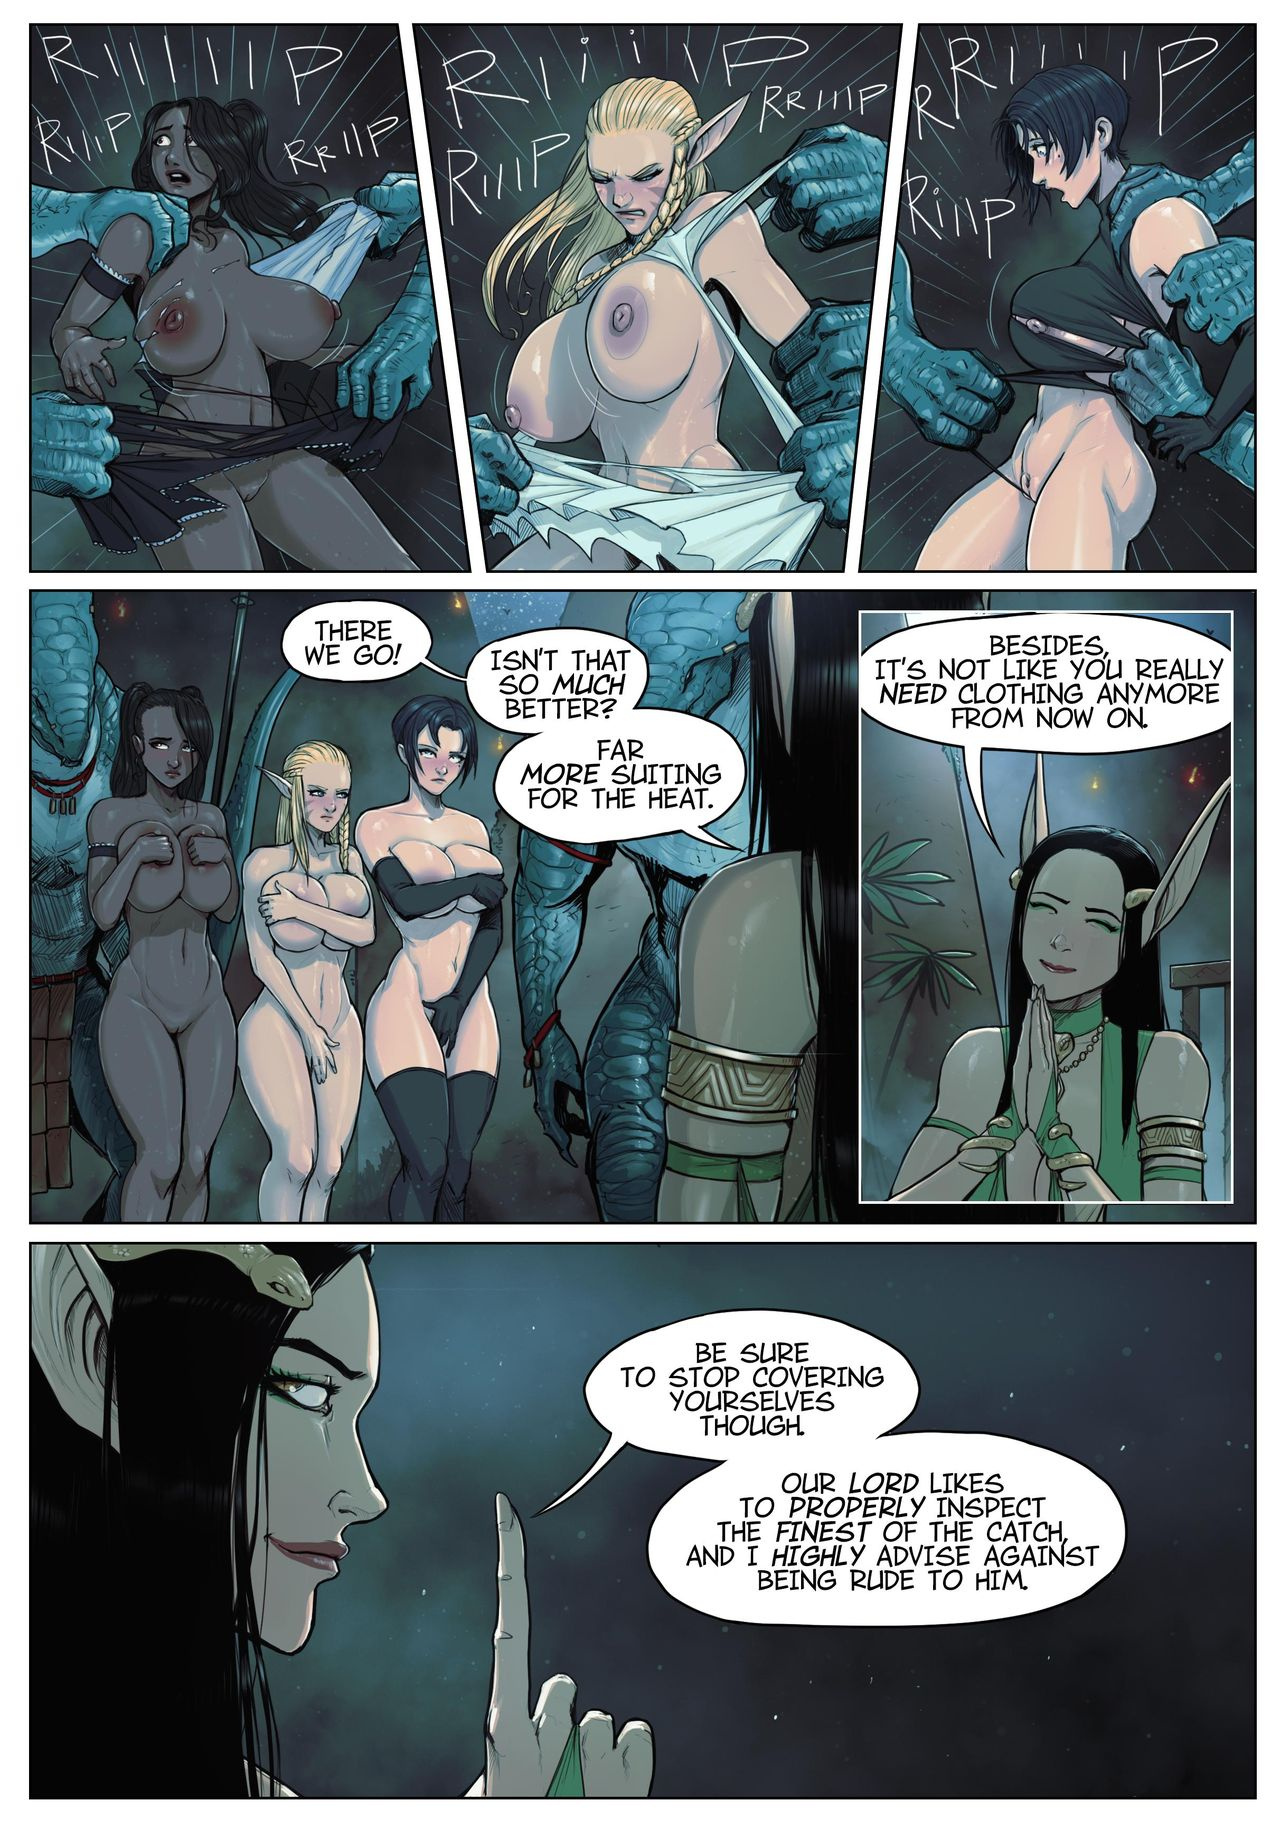 It's a Pleasure to Serve porn comics Oral sex, Big Tits, Blowjob, Creampie, Cum Swallow, Fantasy, Group Sex, Masturbation, Rape, Stockings, Straight, X-Ray